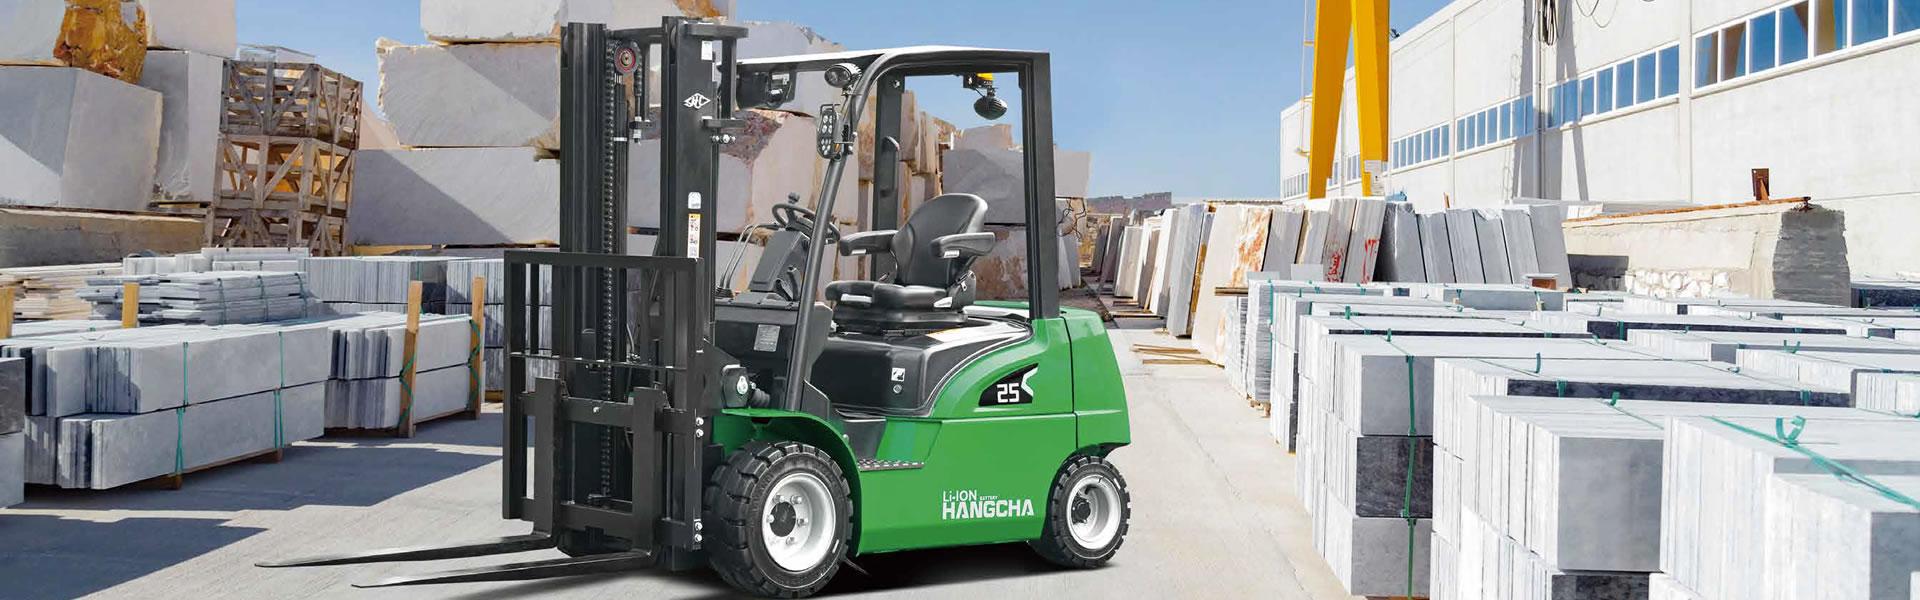 Rough Terrain – 2.5 – 3.5t 4WD Diesel Forklift Hangcha Trucks